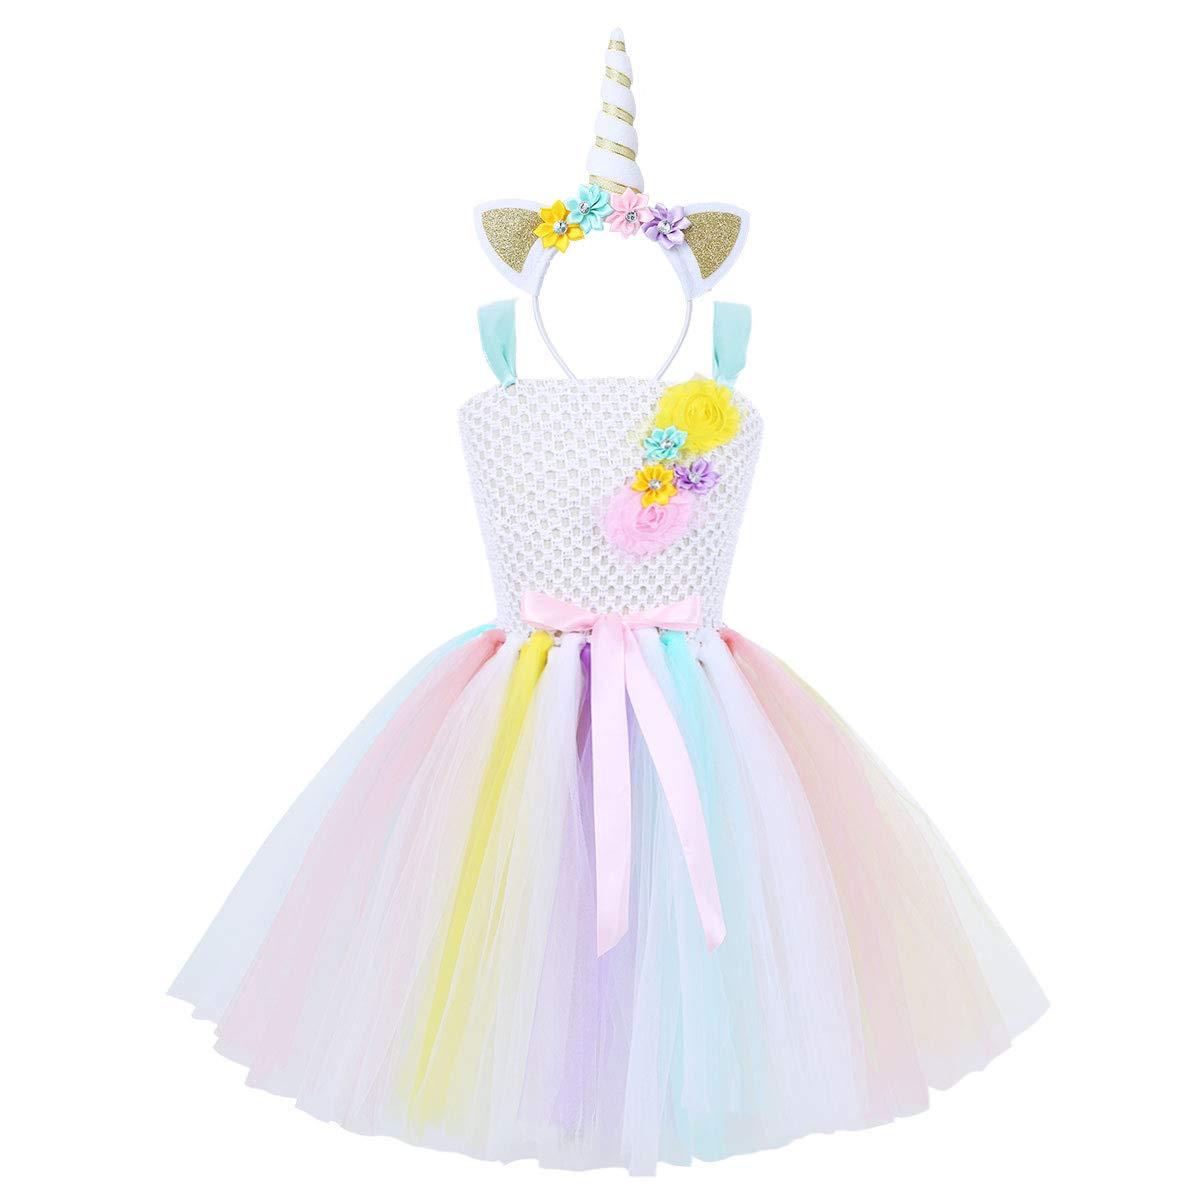 Amazon.com: TiaoBug Kids Girls Rainbow Cartoon Tutu Dress Princess Costume with Headband for Cosplay Birthday Party: Clothing